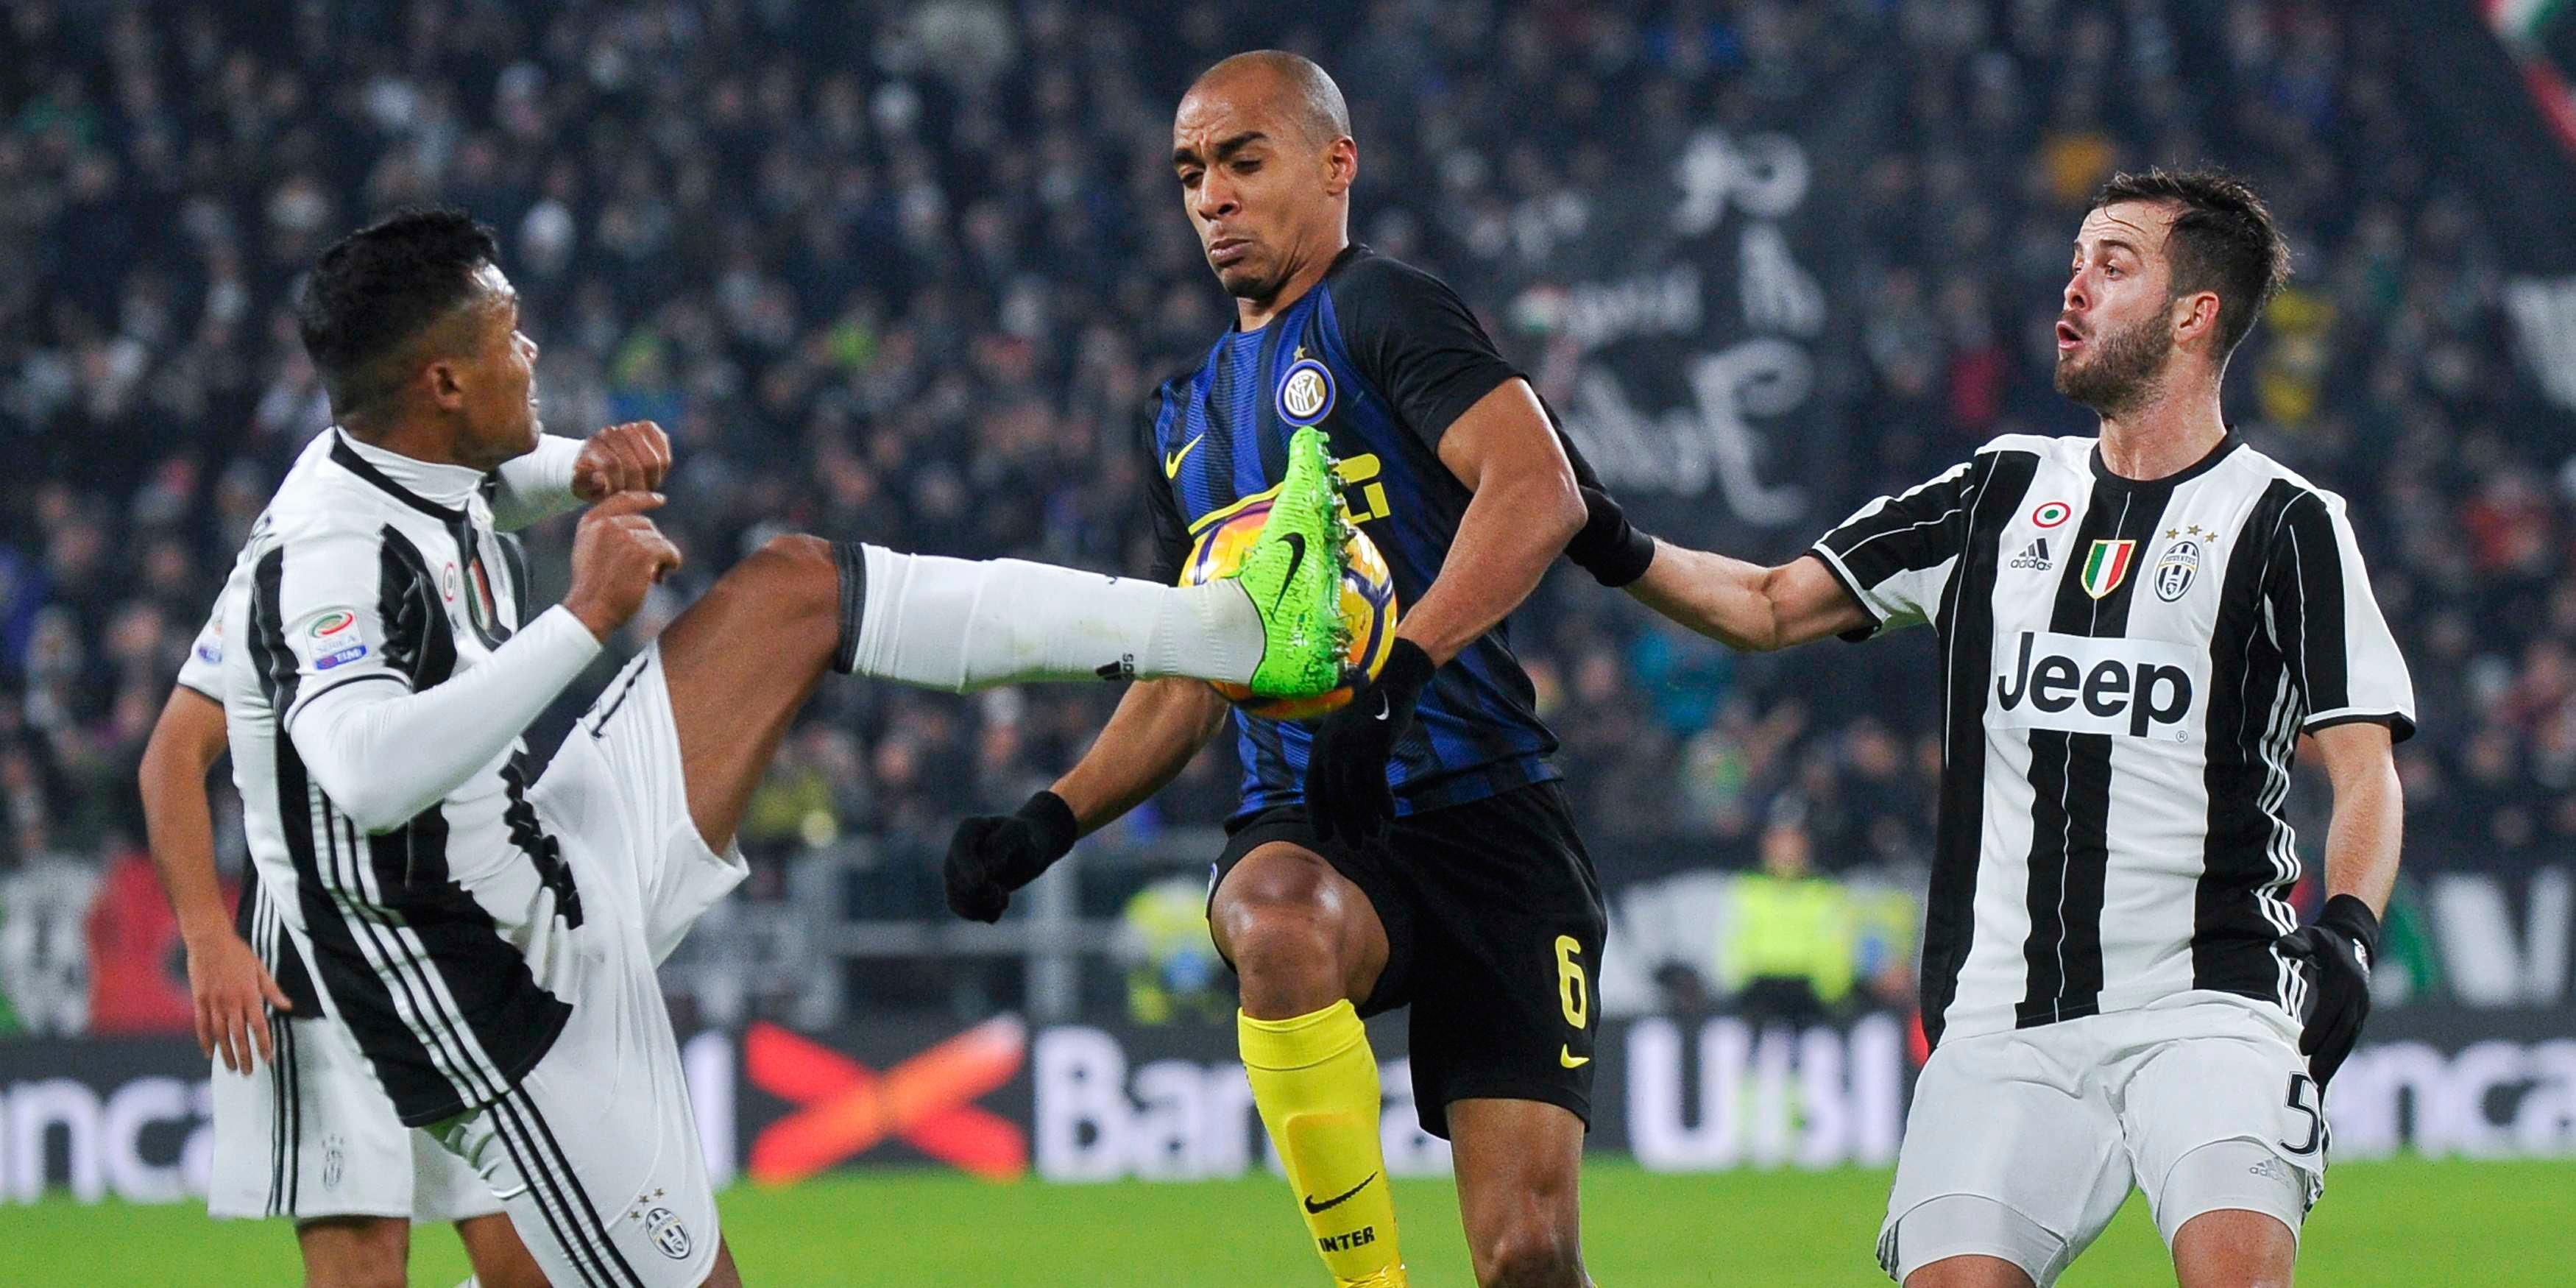 Интер – Фиорентина прогноз на встречу чемпионата Италии